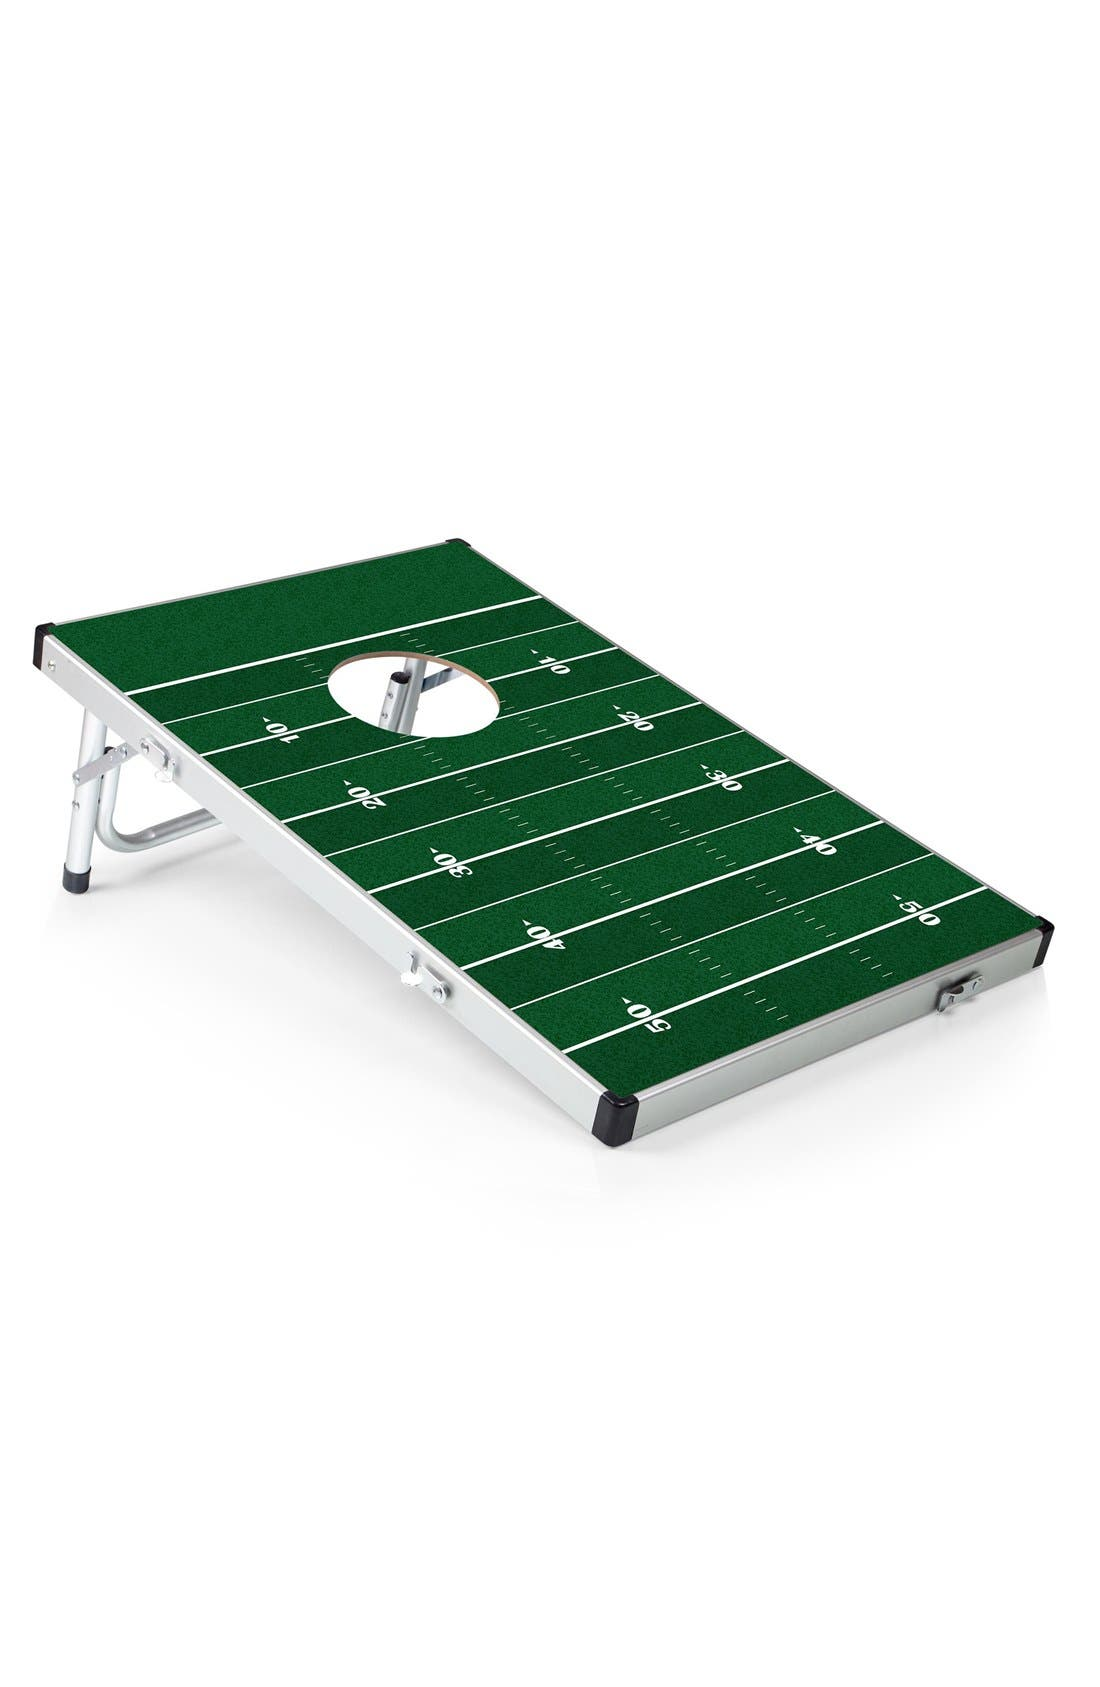 'Football' Bean Bag Toss Game,                         Main,                         color, Green